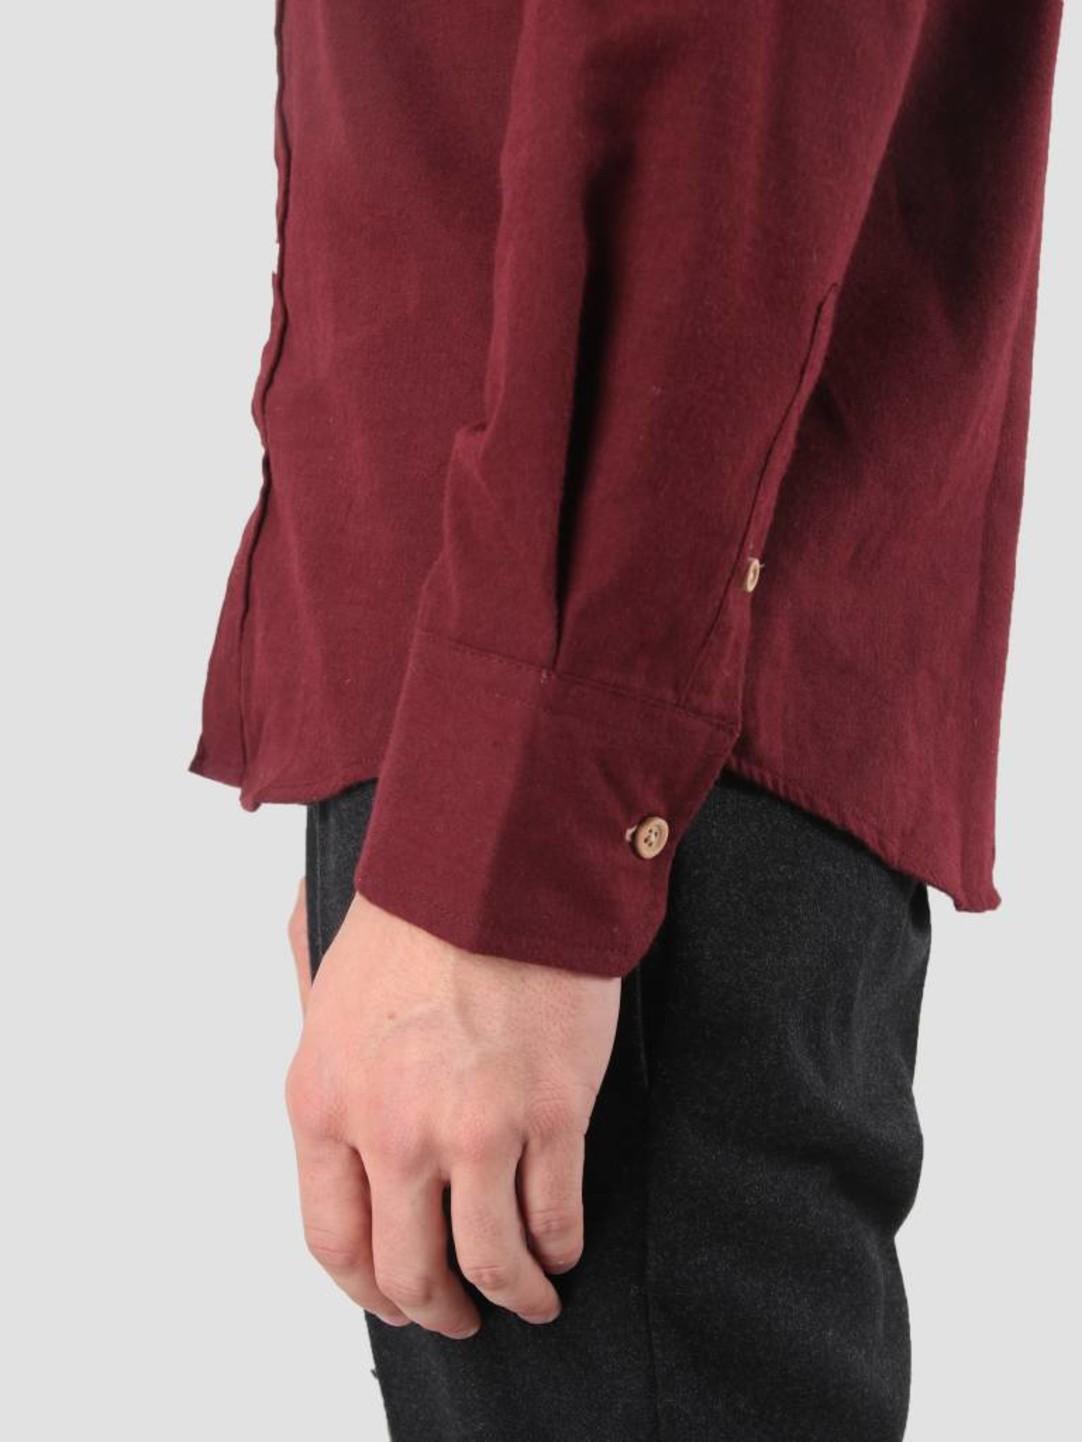 Kronstadt Kronstadt Dean Diego Shirt Bordeaux KRFH18-KS2546